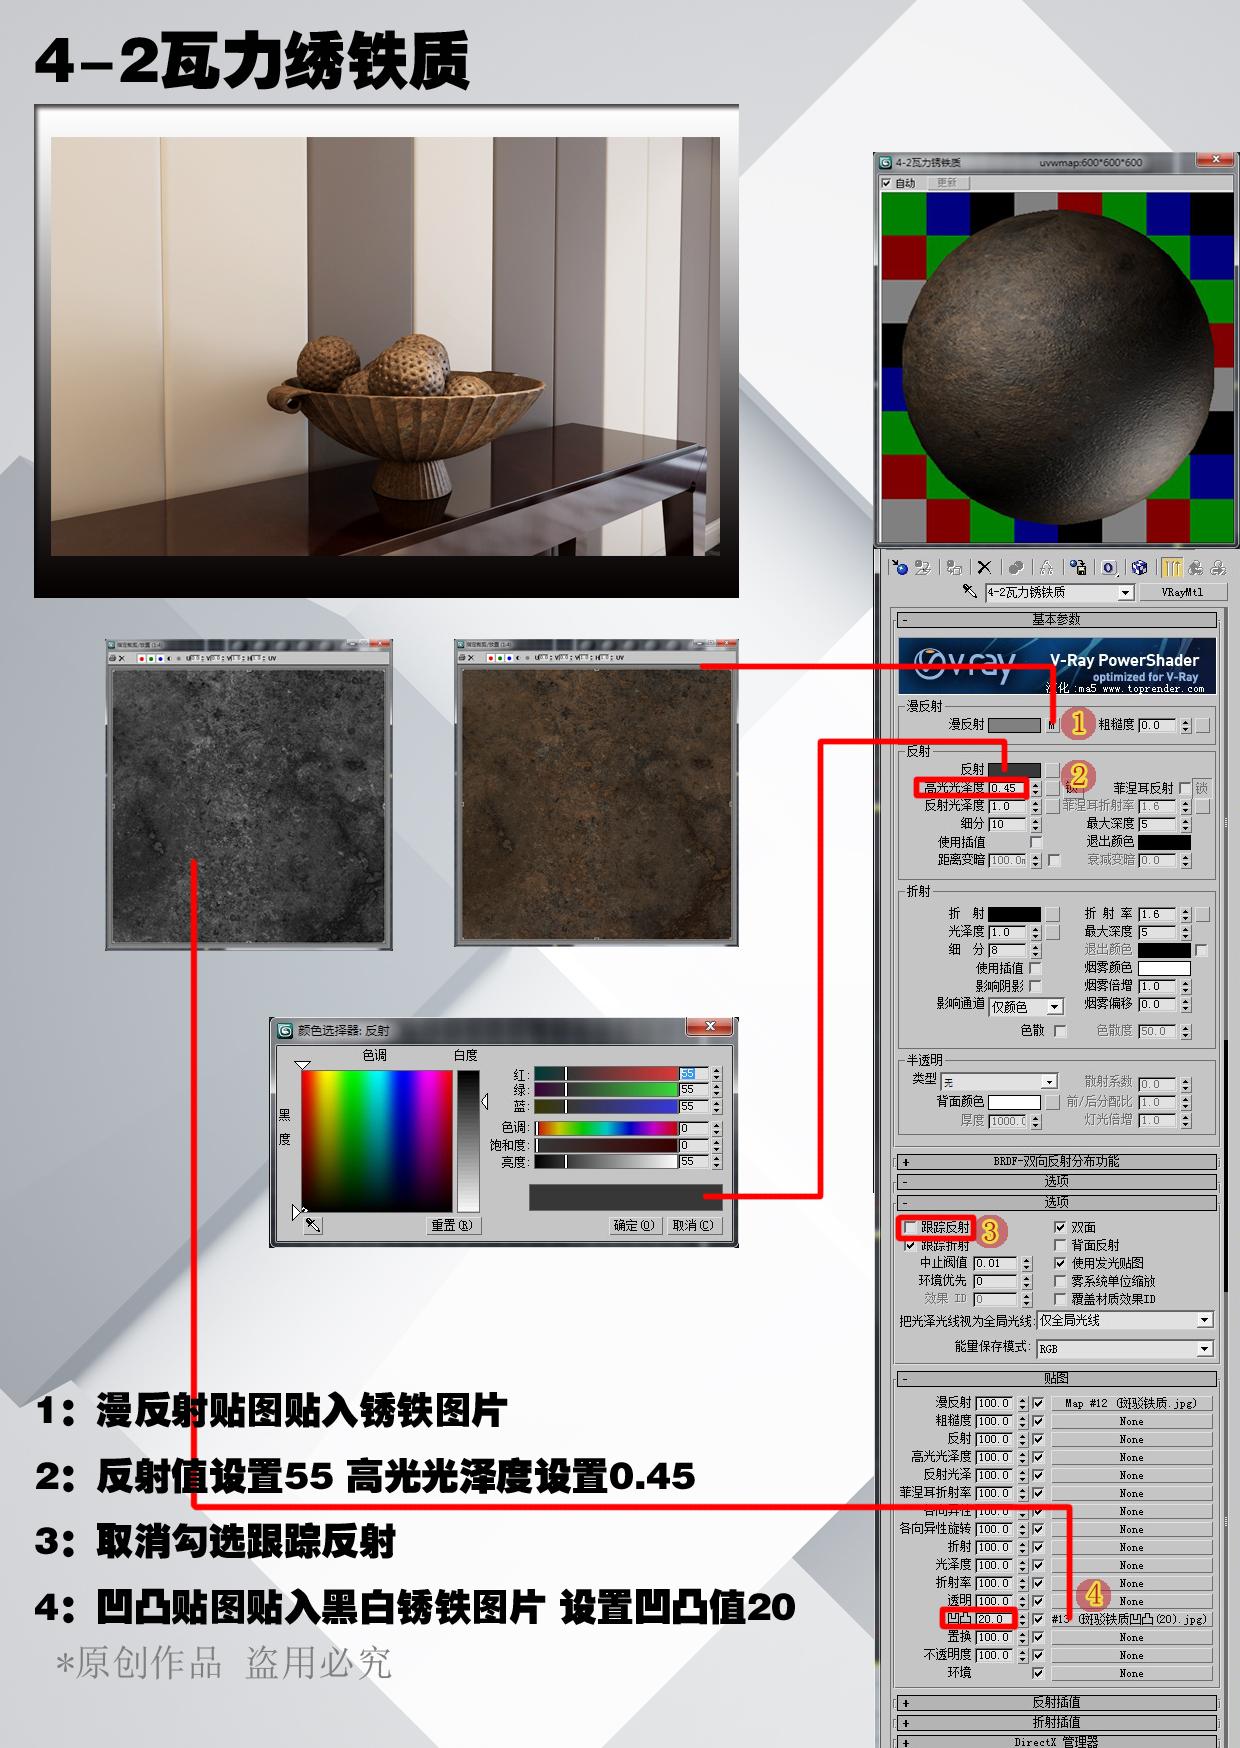 WIN7版本瓦力3D材质库 有材质参数参考图